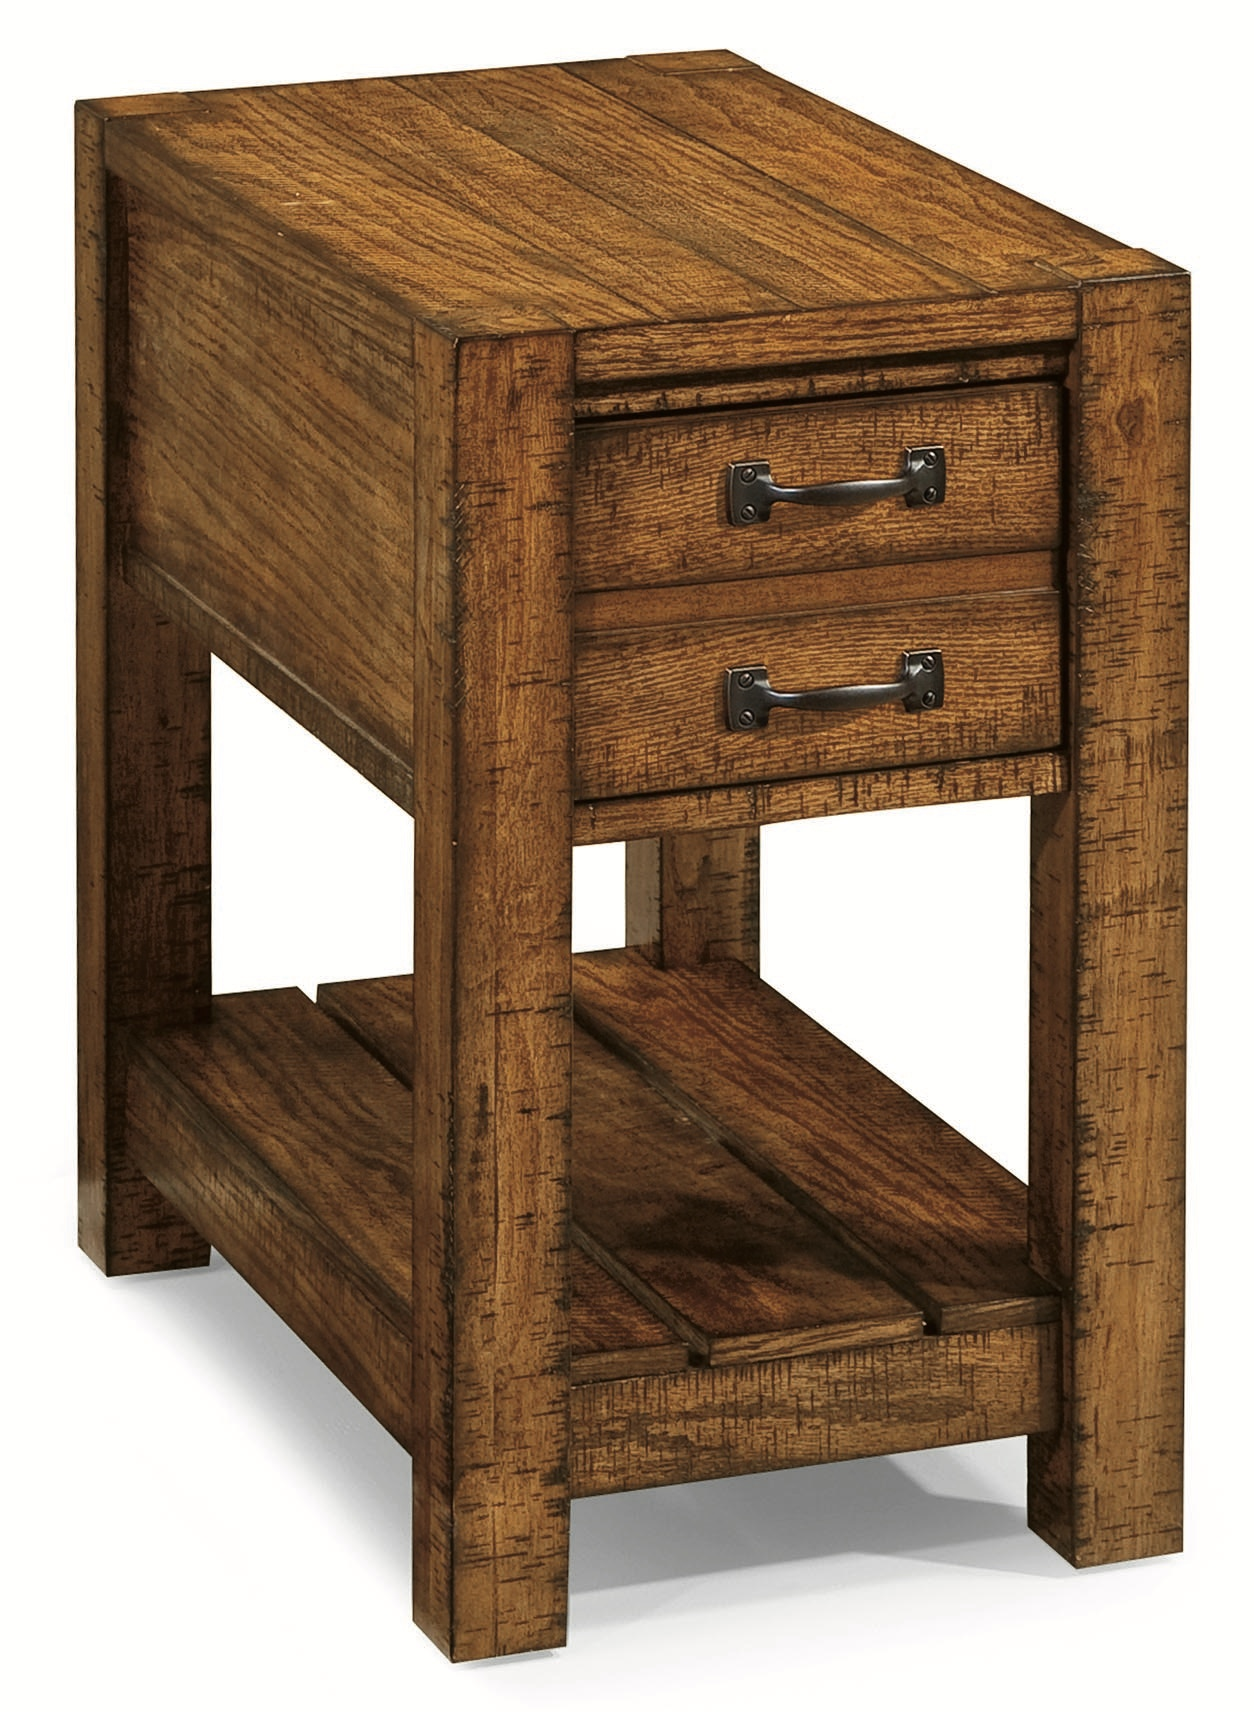 Ordinaire Peters Revington Chairside Table 563482